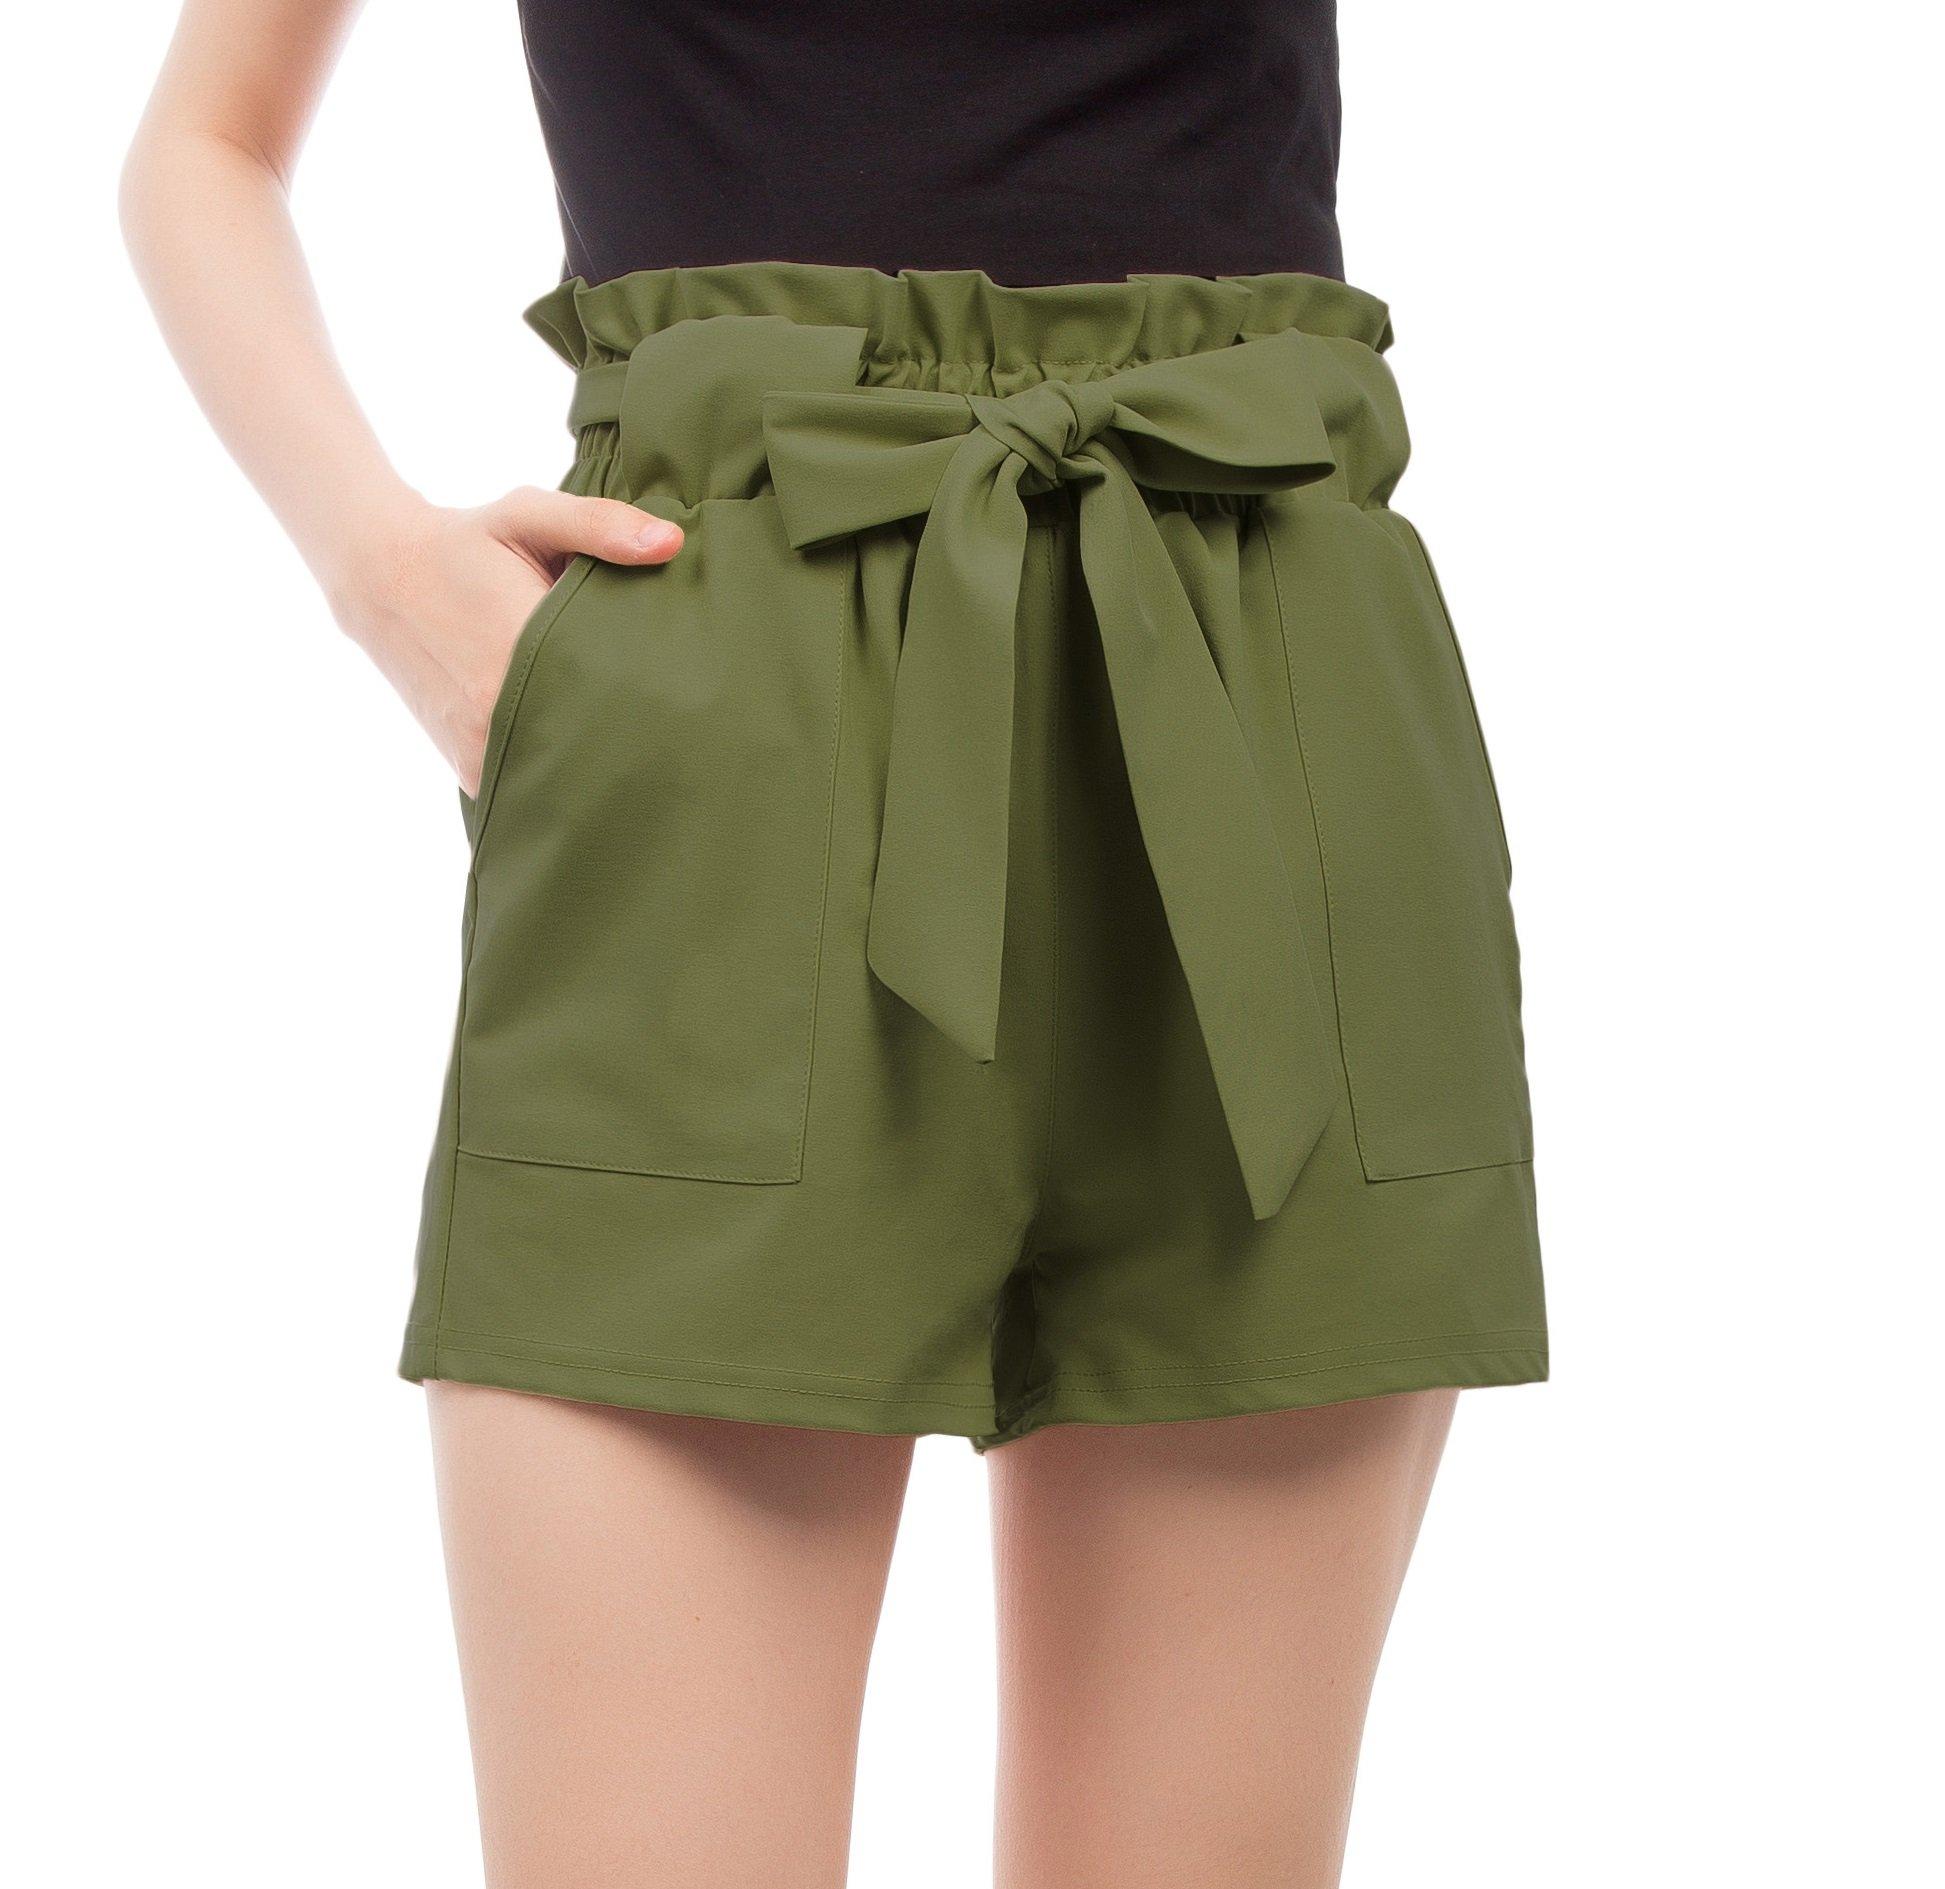 Women's Simple Solid Ruffle Tie Waist Shorts XXL Army Green-2